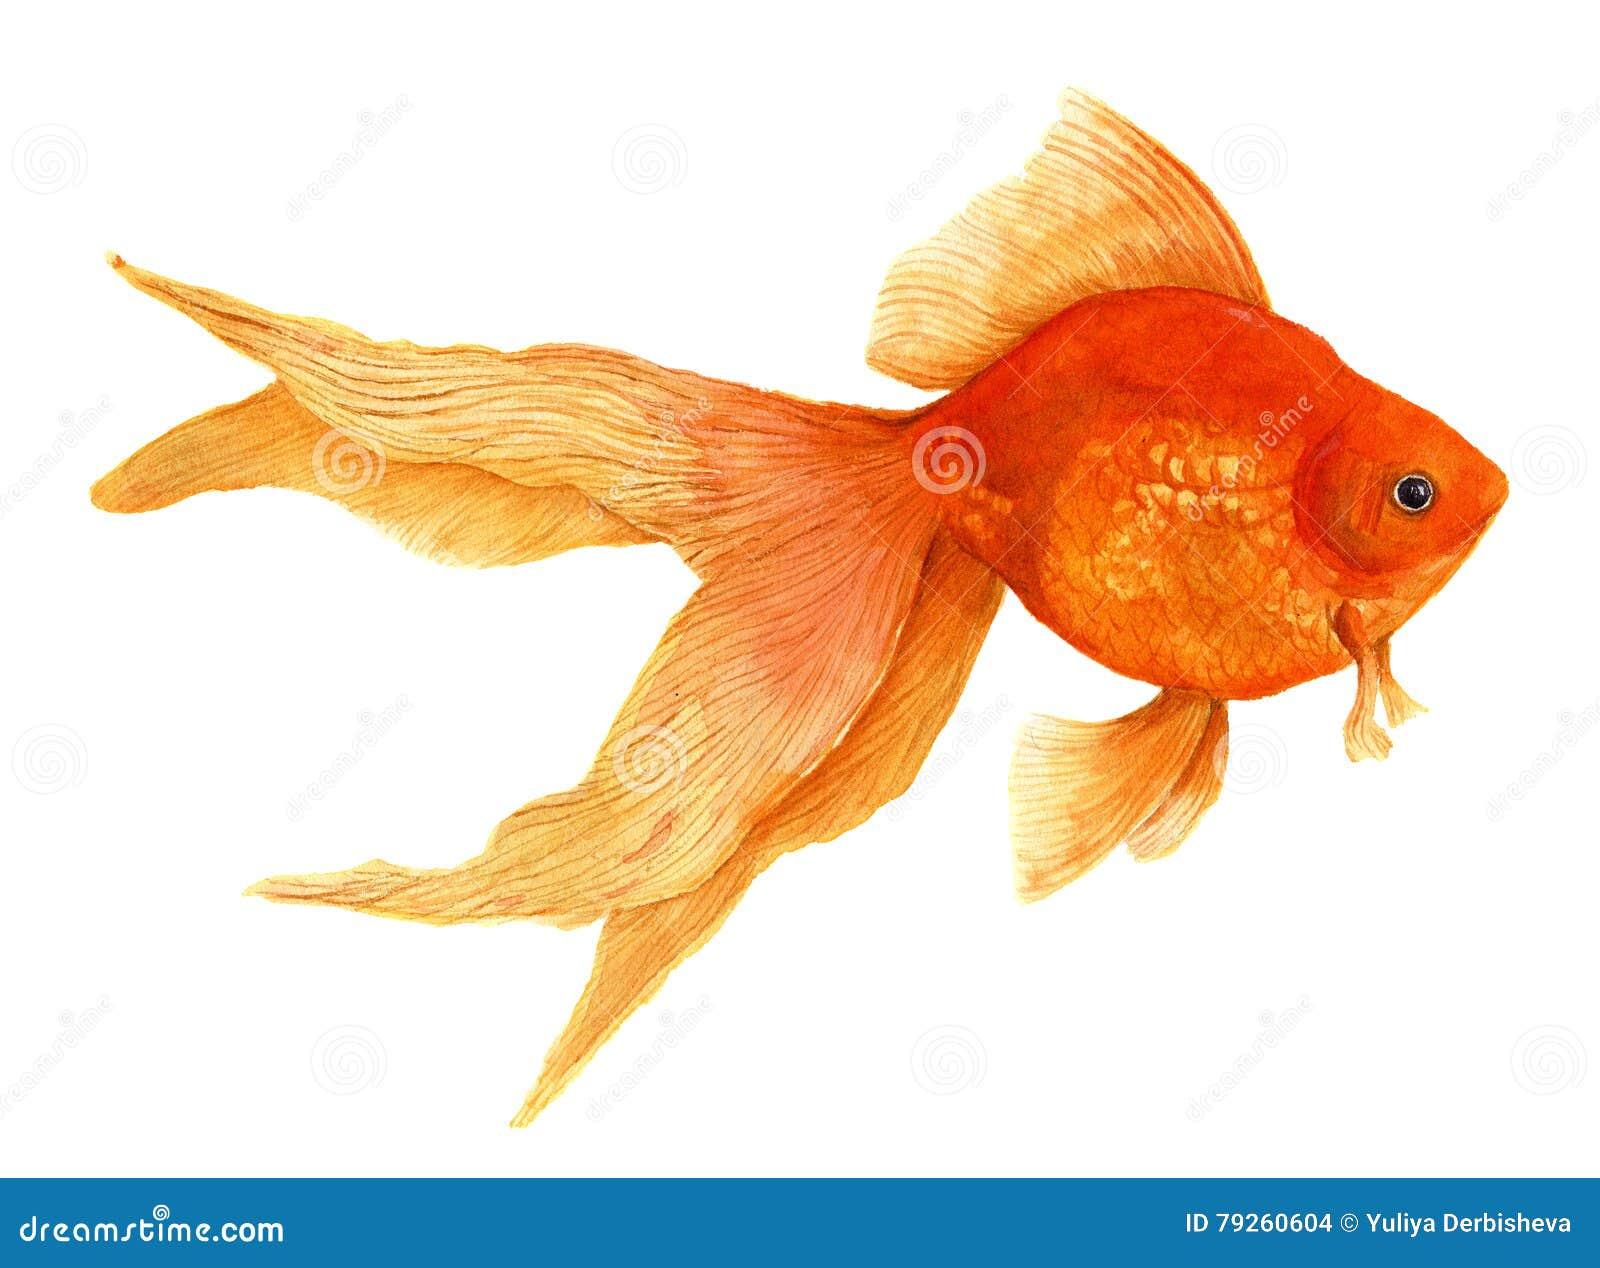 Goldfish. Watercolor artistic realistic illustration